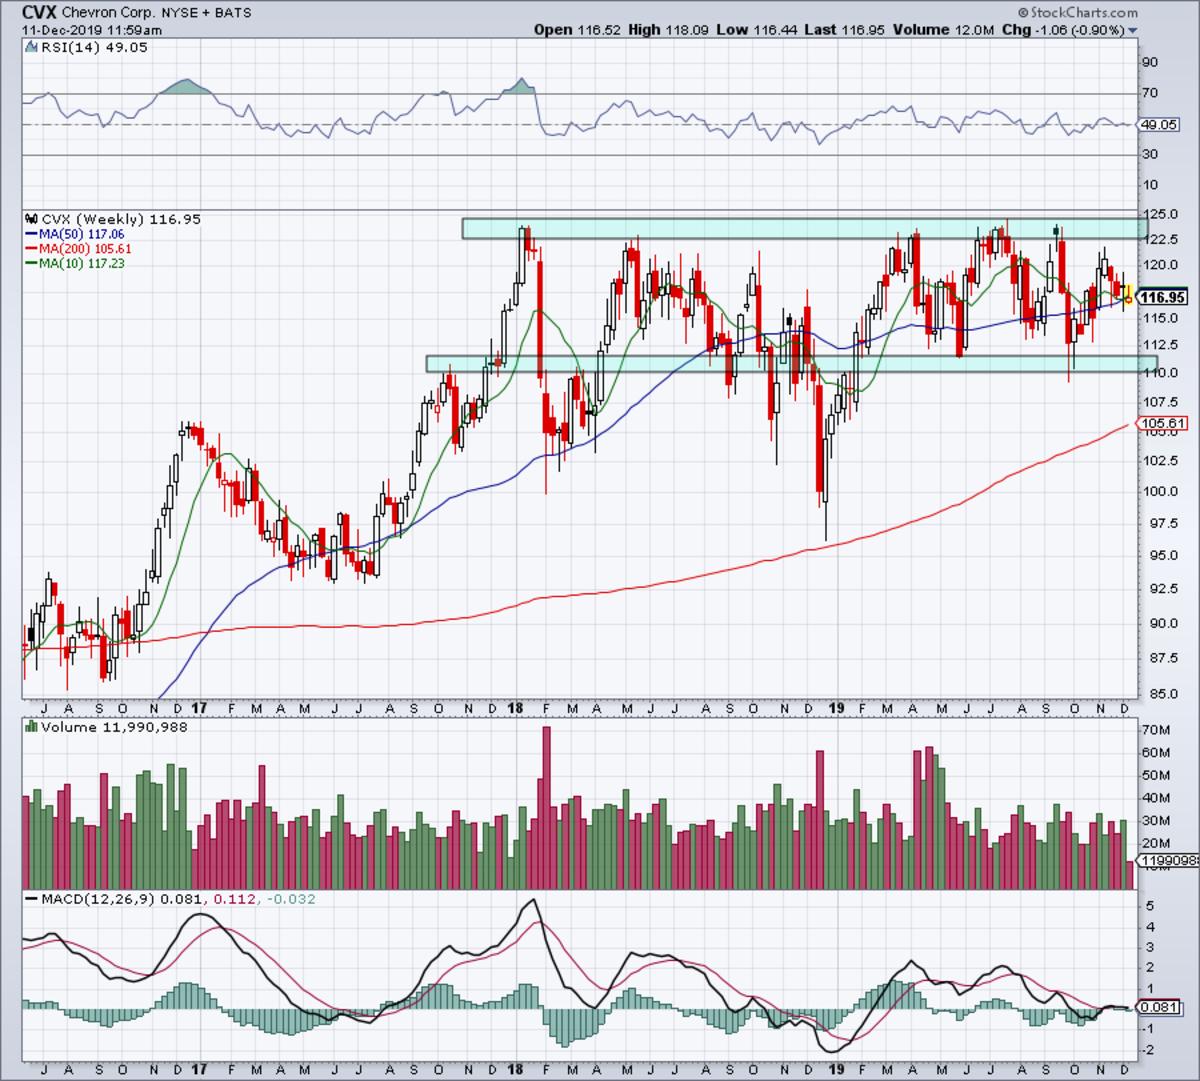 Weekly chart of Chevron stock.